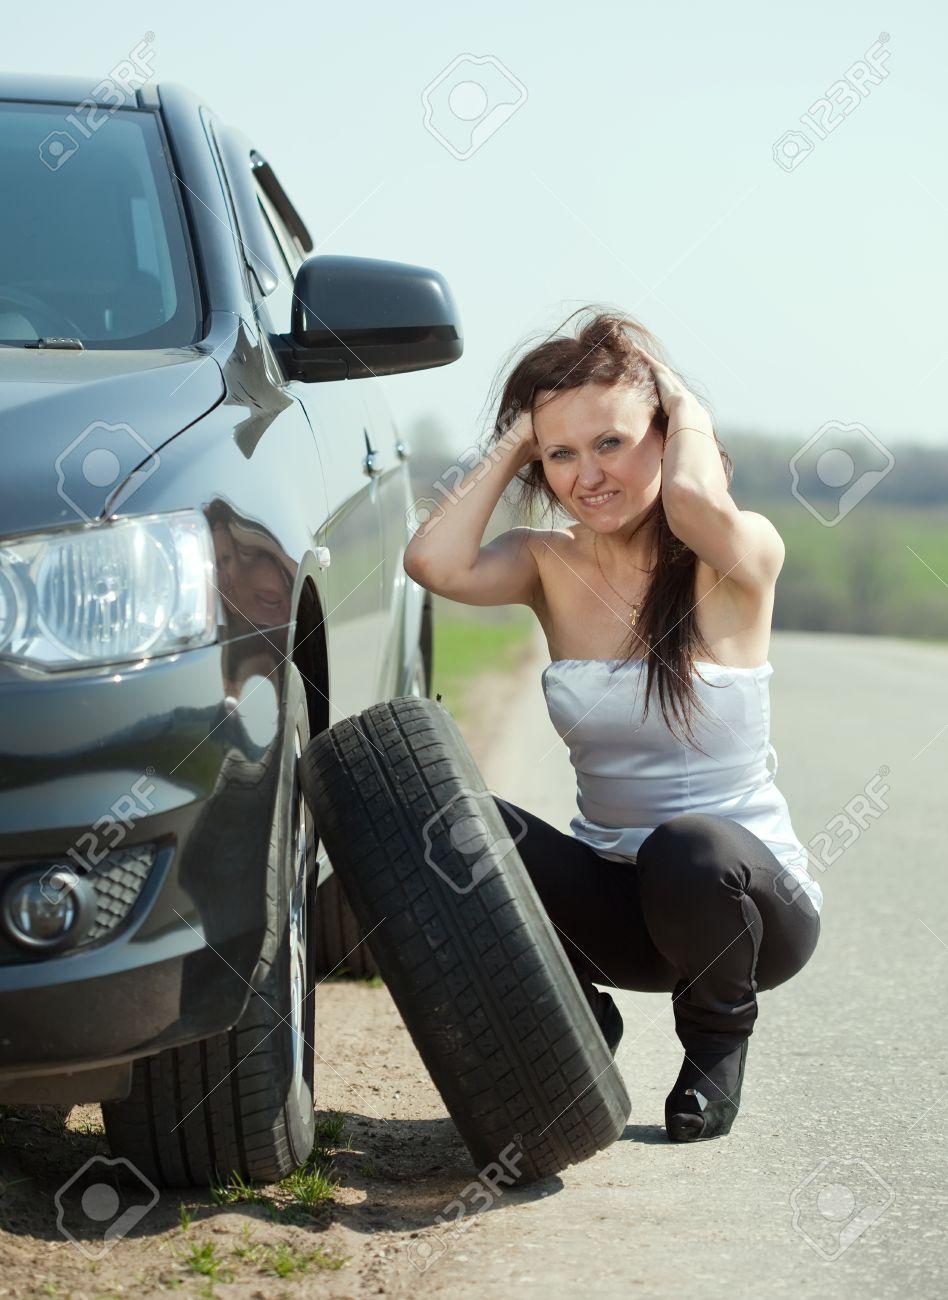 Woman changing car wheel at road Stock Photo - 12289292